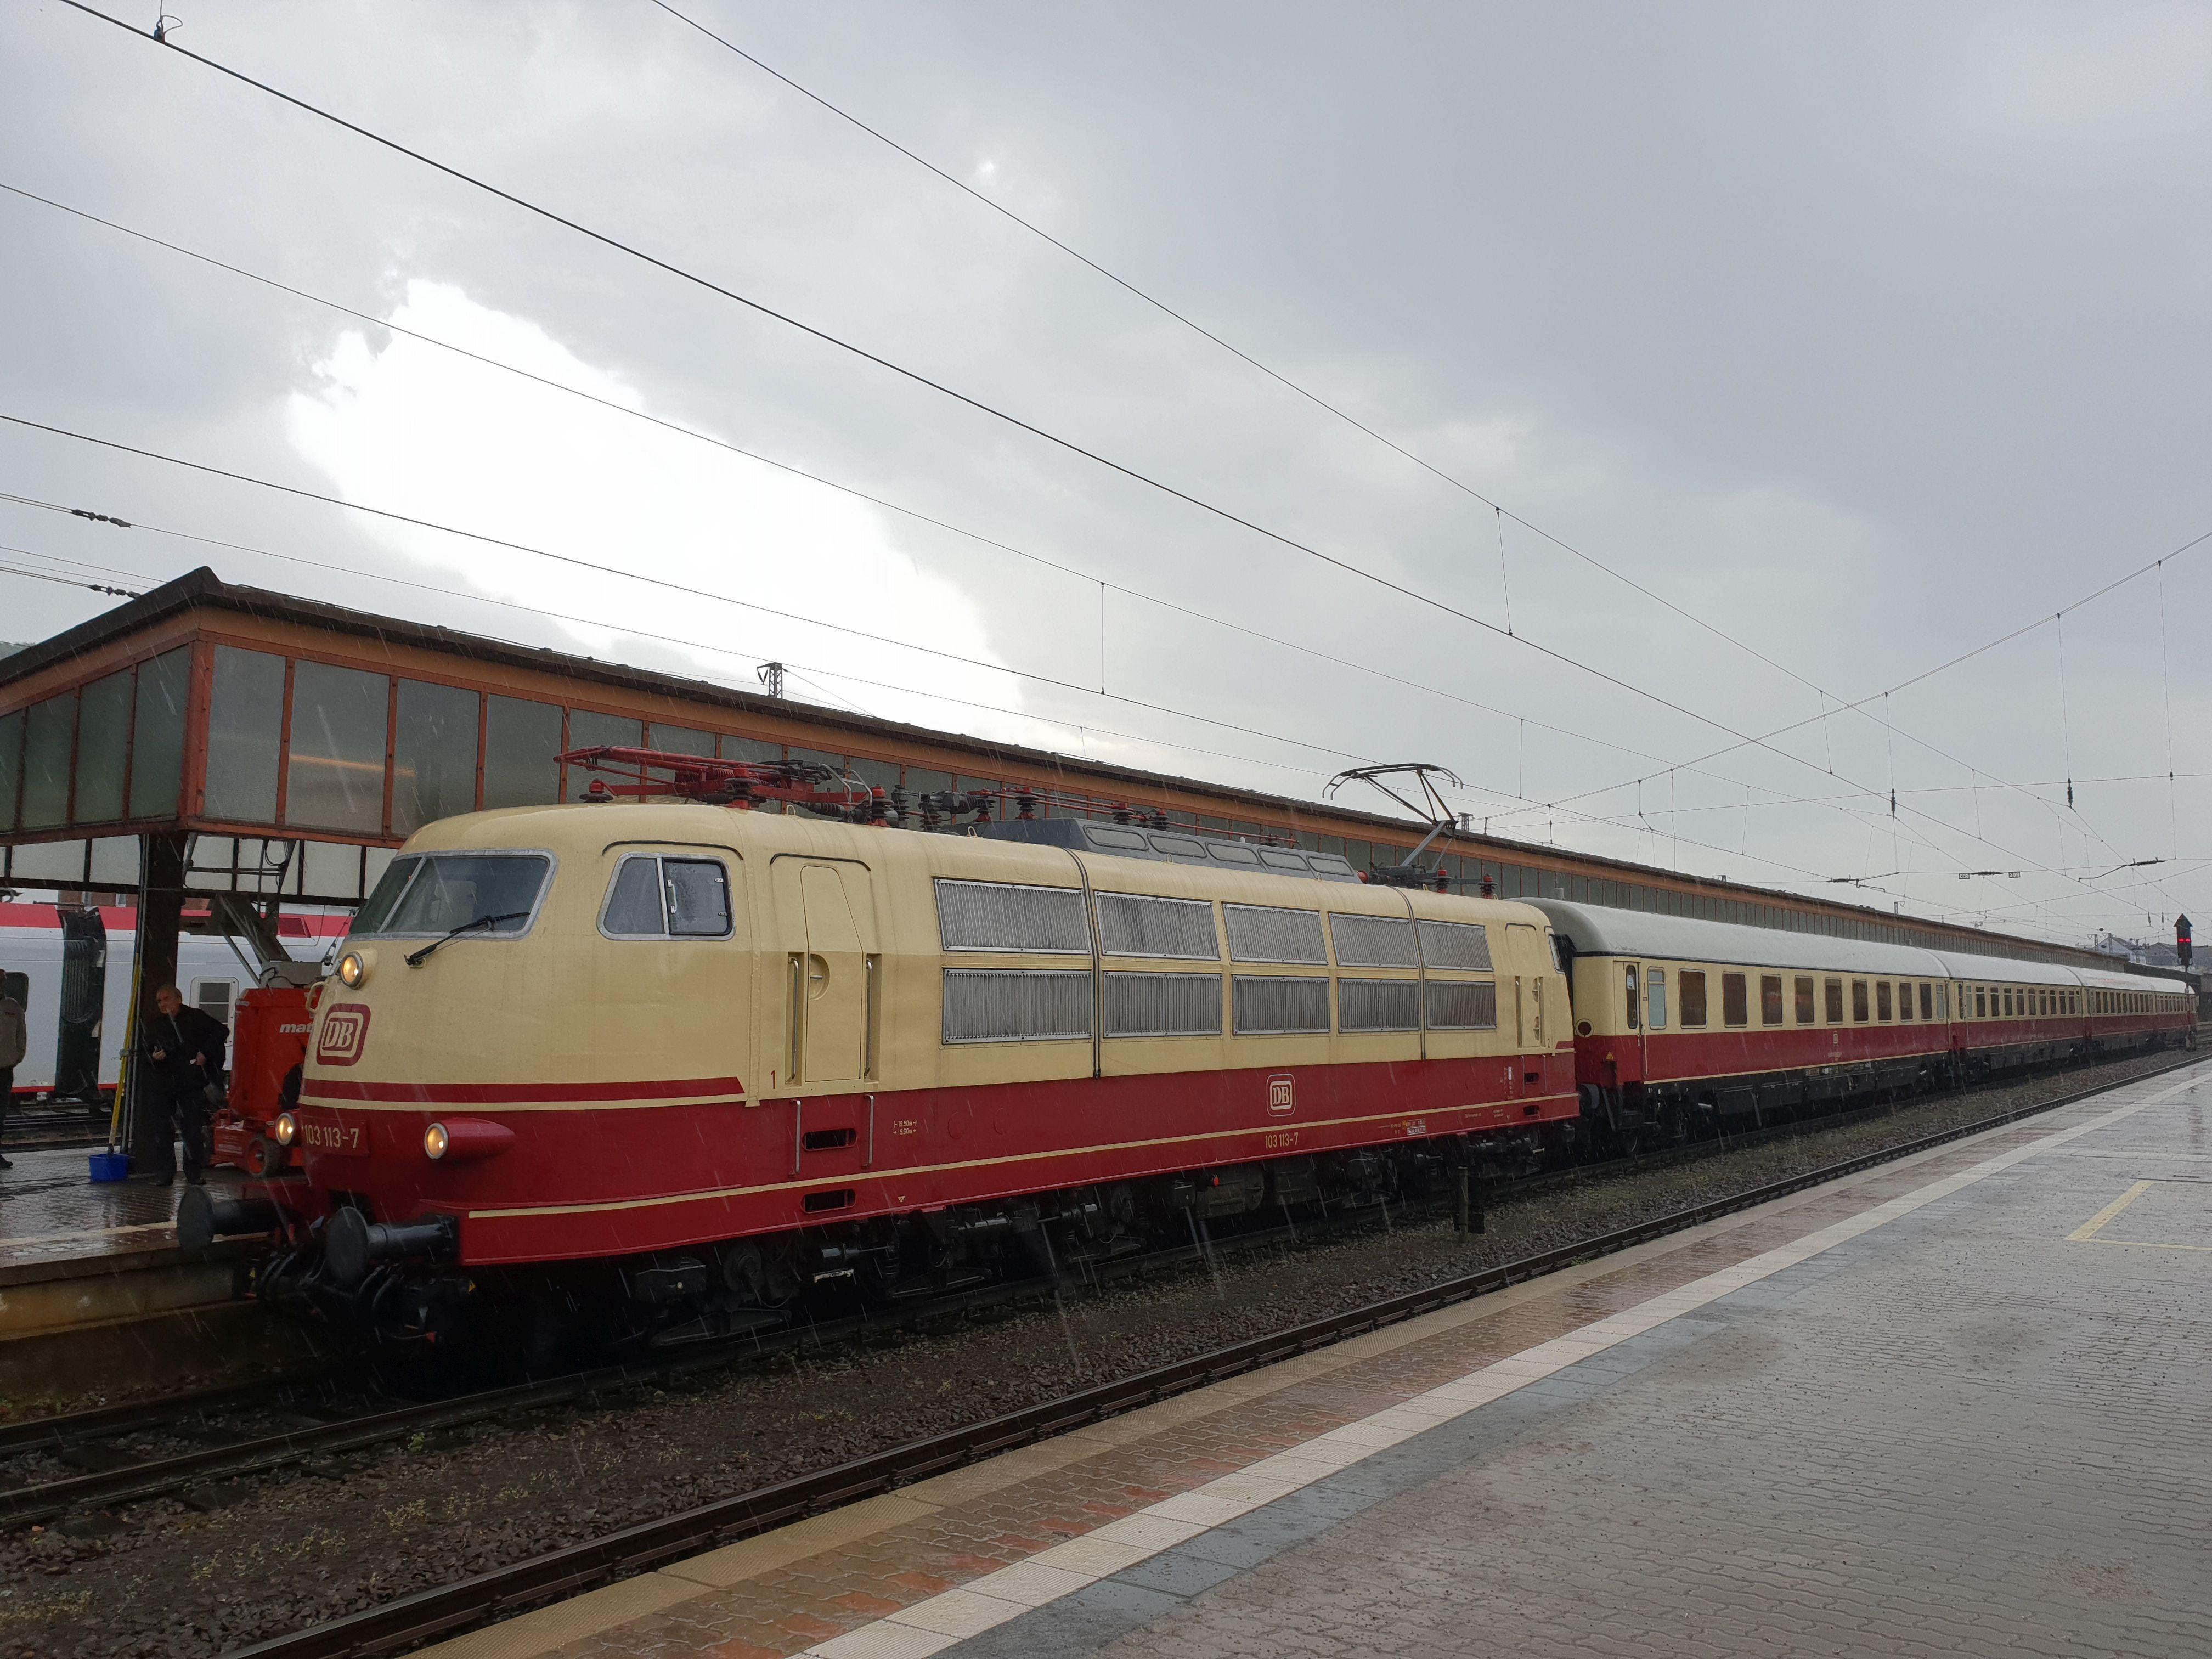 Lok 103 113, Trier, 2018